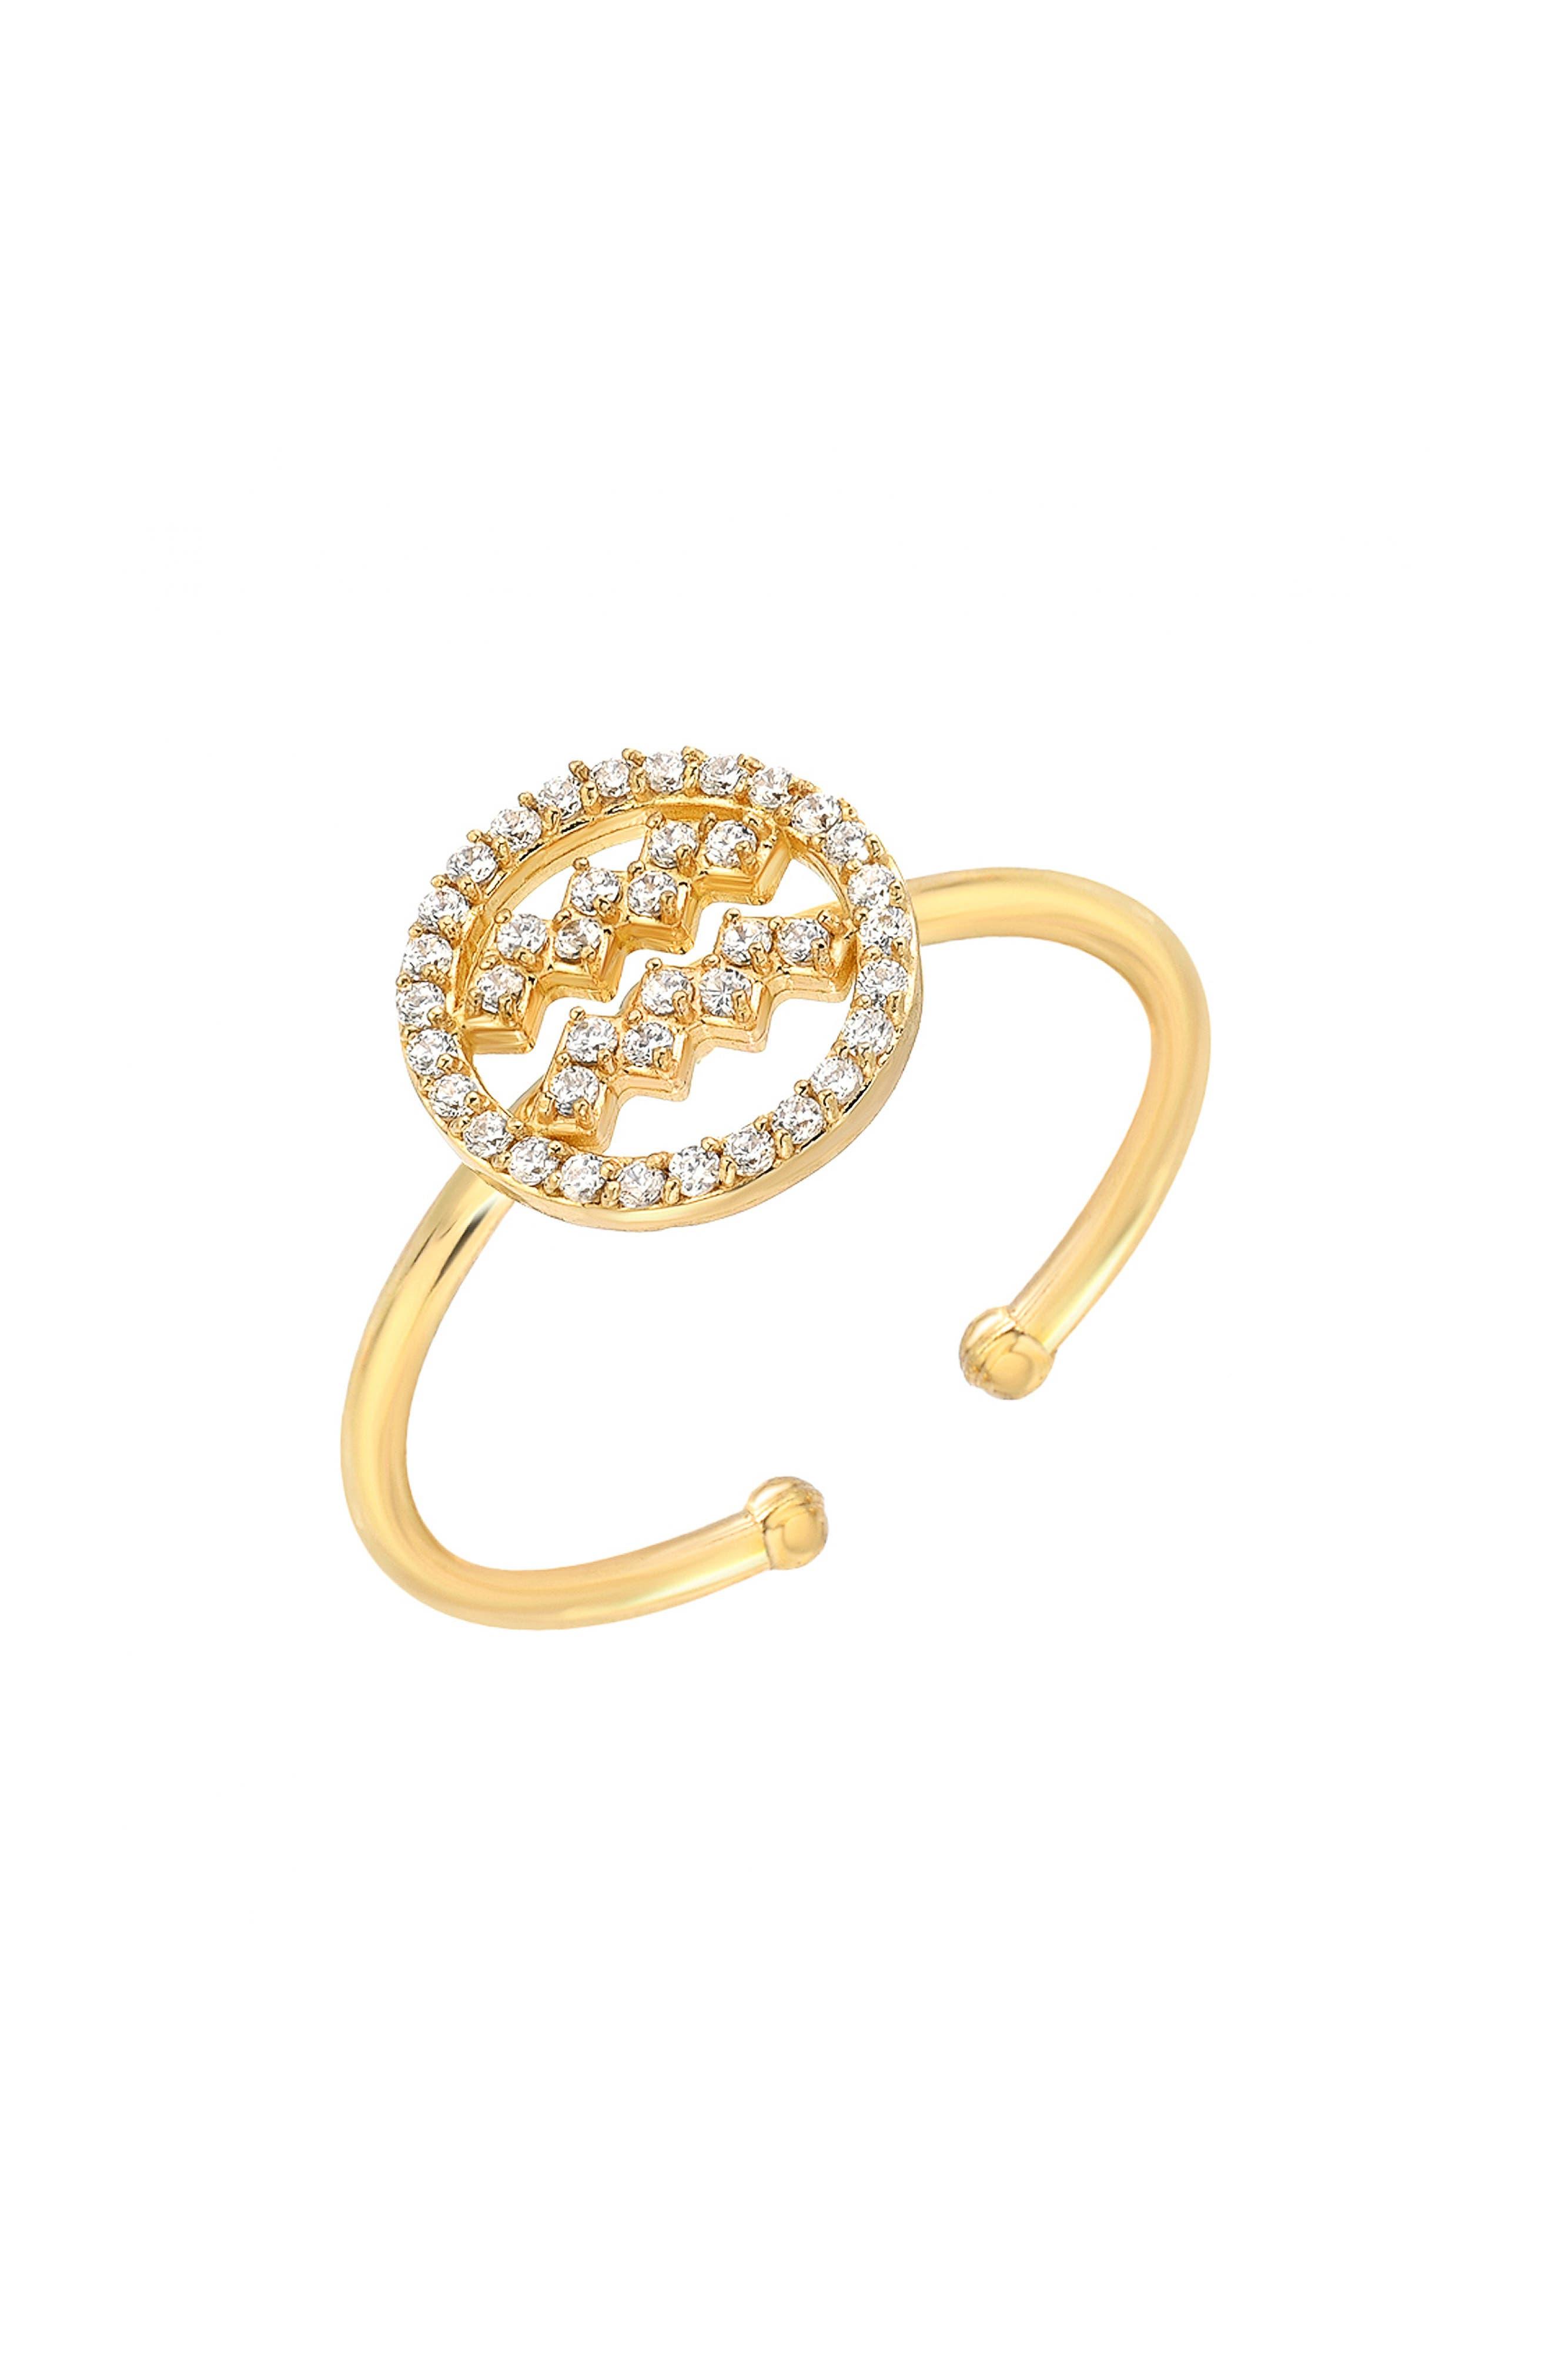 MINI MINI JEWELS Halo Zodiac Sign Diamond Ring, Main, color, YELLOW GOLD-AQUARIUS